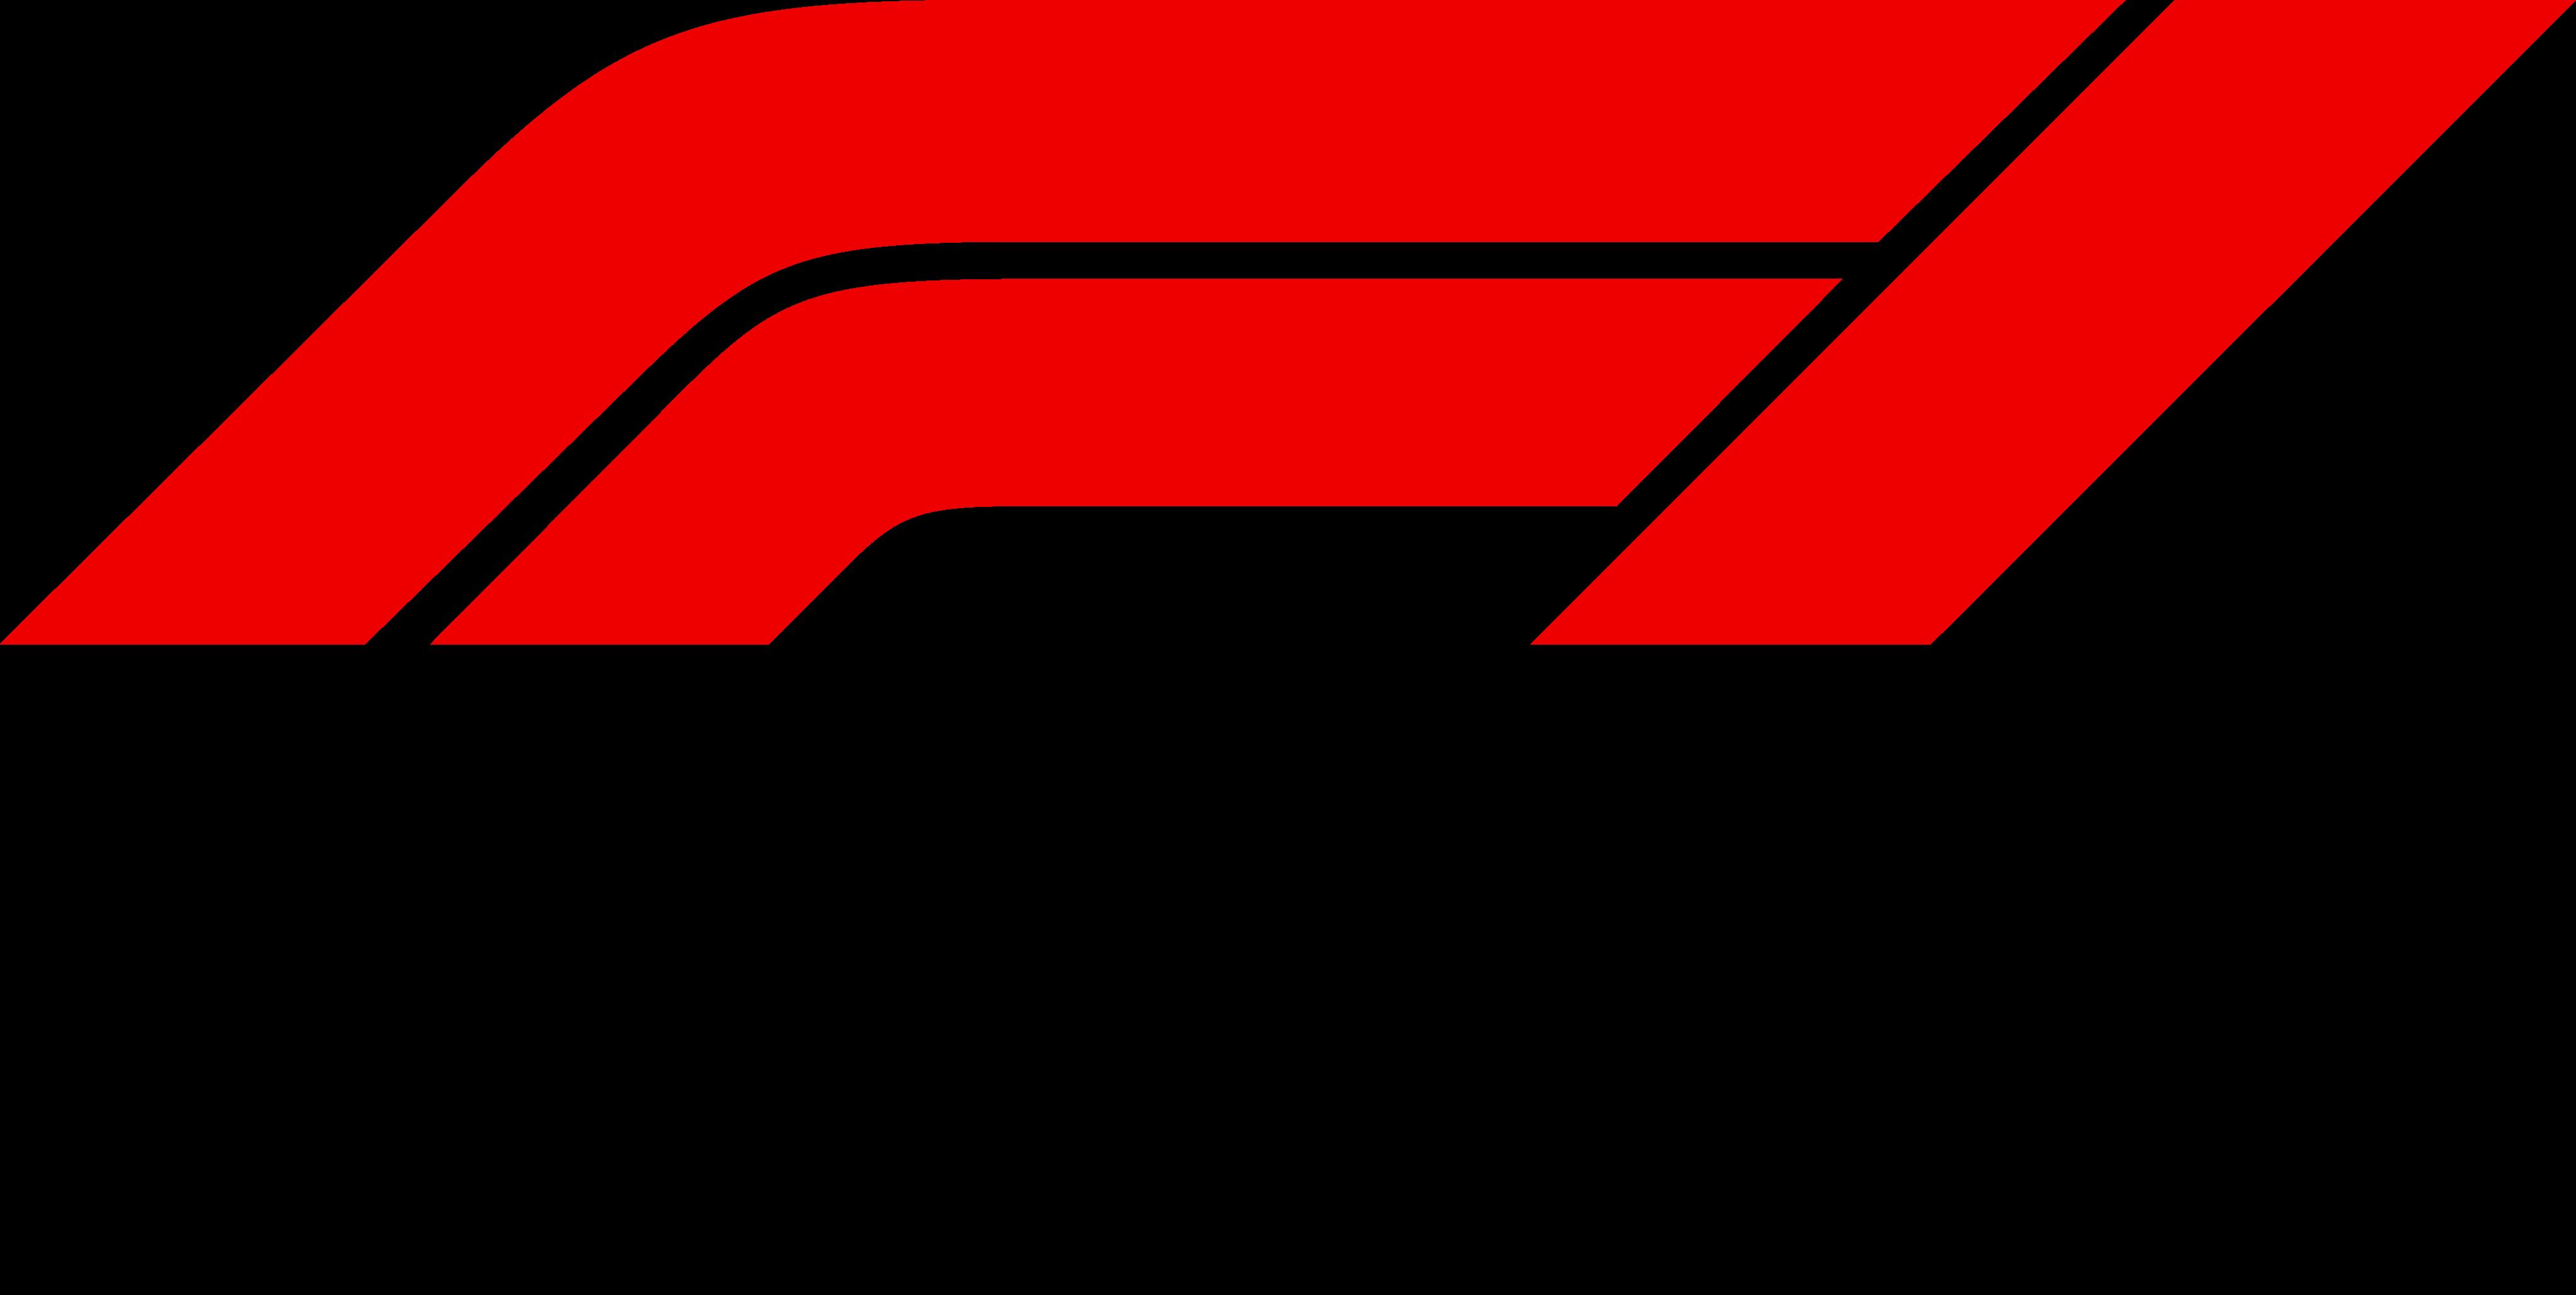 formula 1 logo 2 2 - Formula 1 Logo - F1 Logo